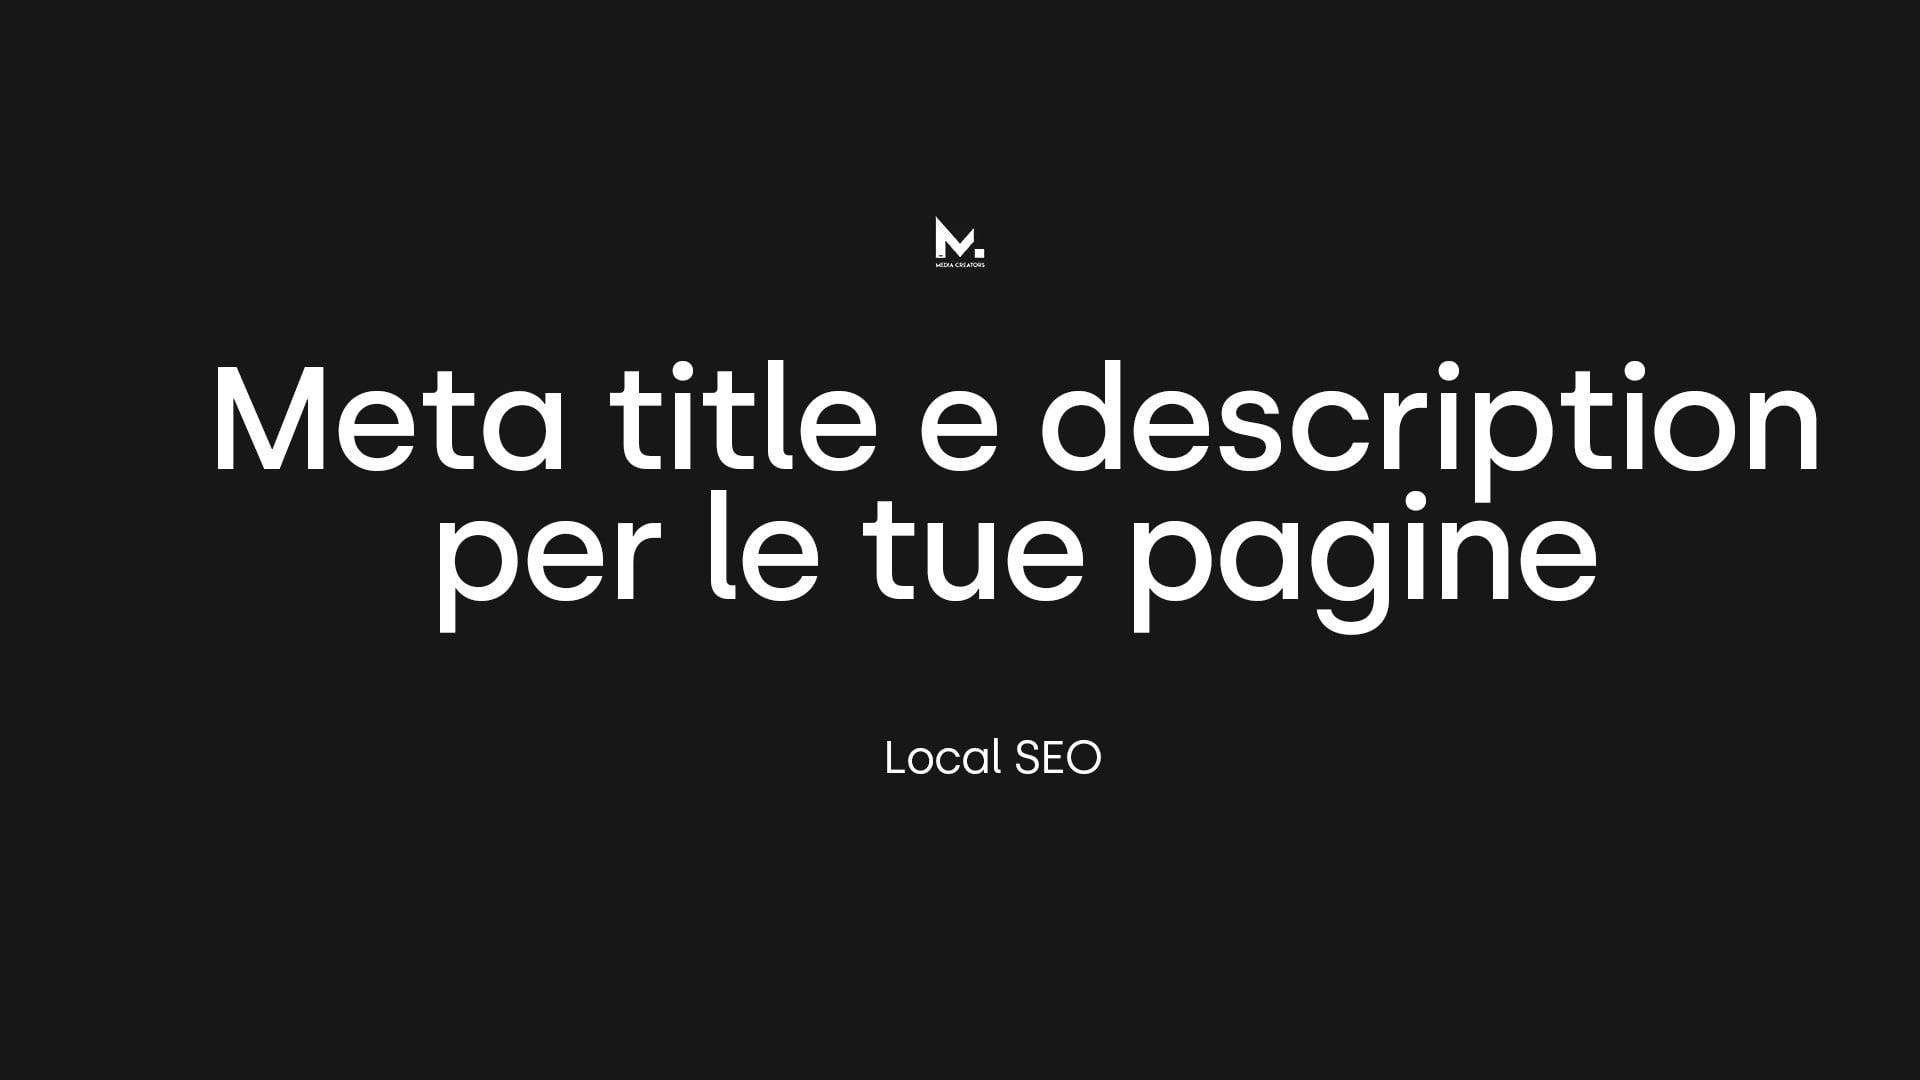 Local SEO: Meta title & Description